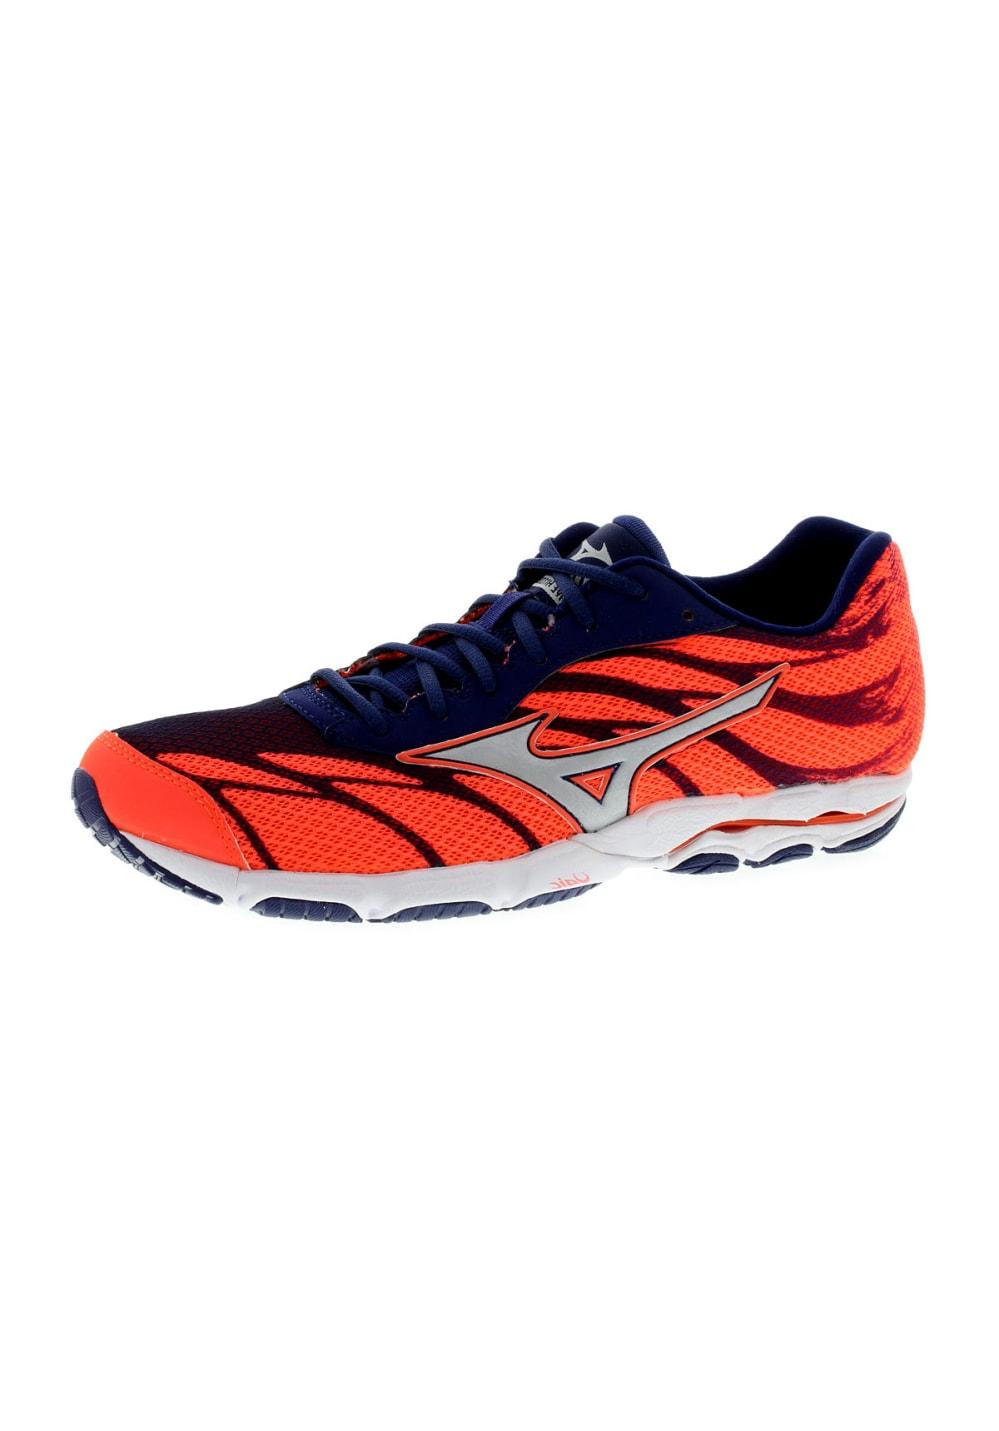 huge discount 7589c b0045 Mizuno Wave Hitogami 3 - Running shoes for Women - Orange